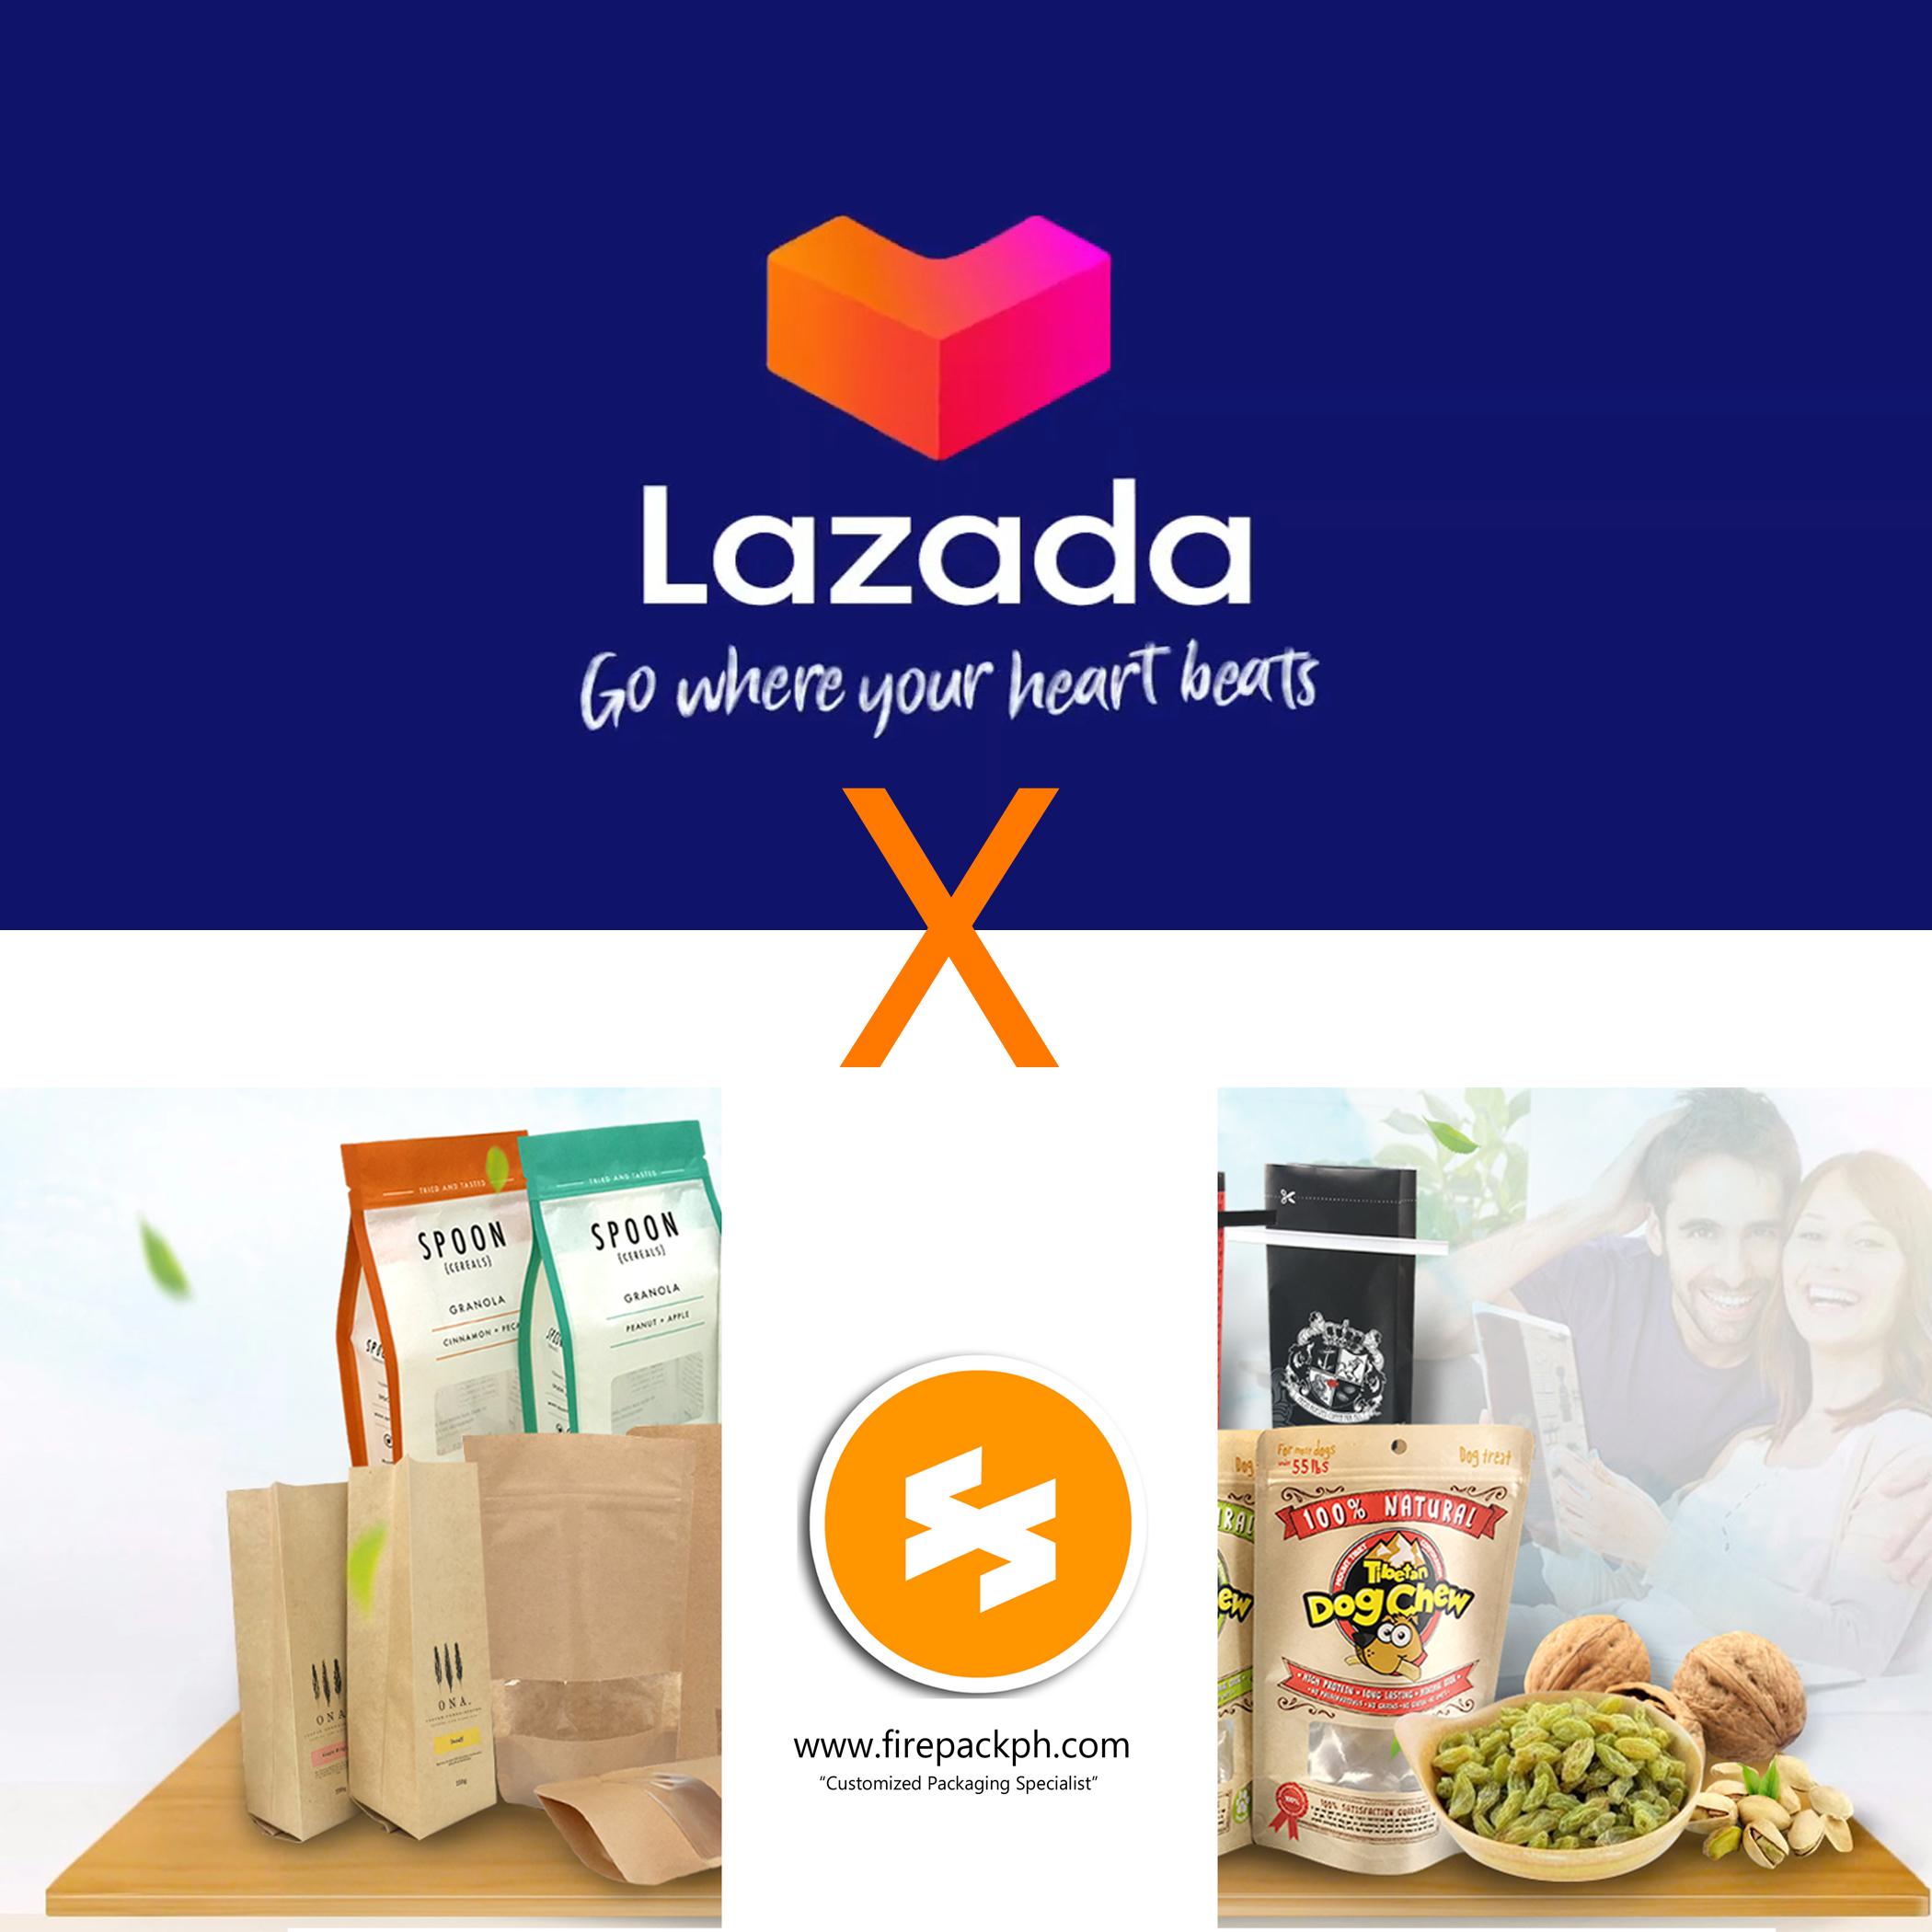 LAZADA ADS